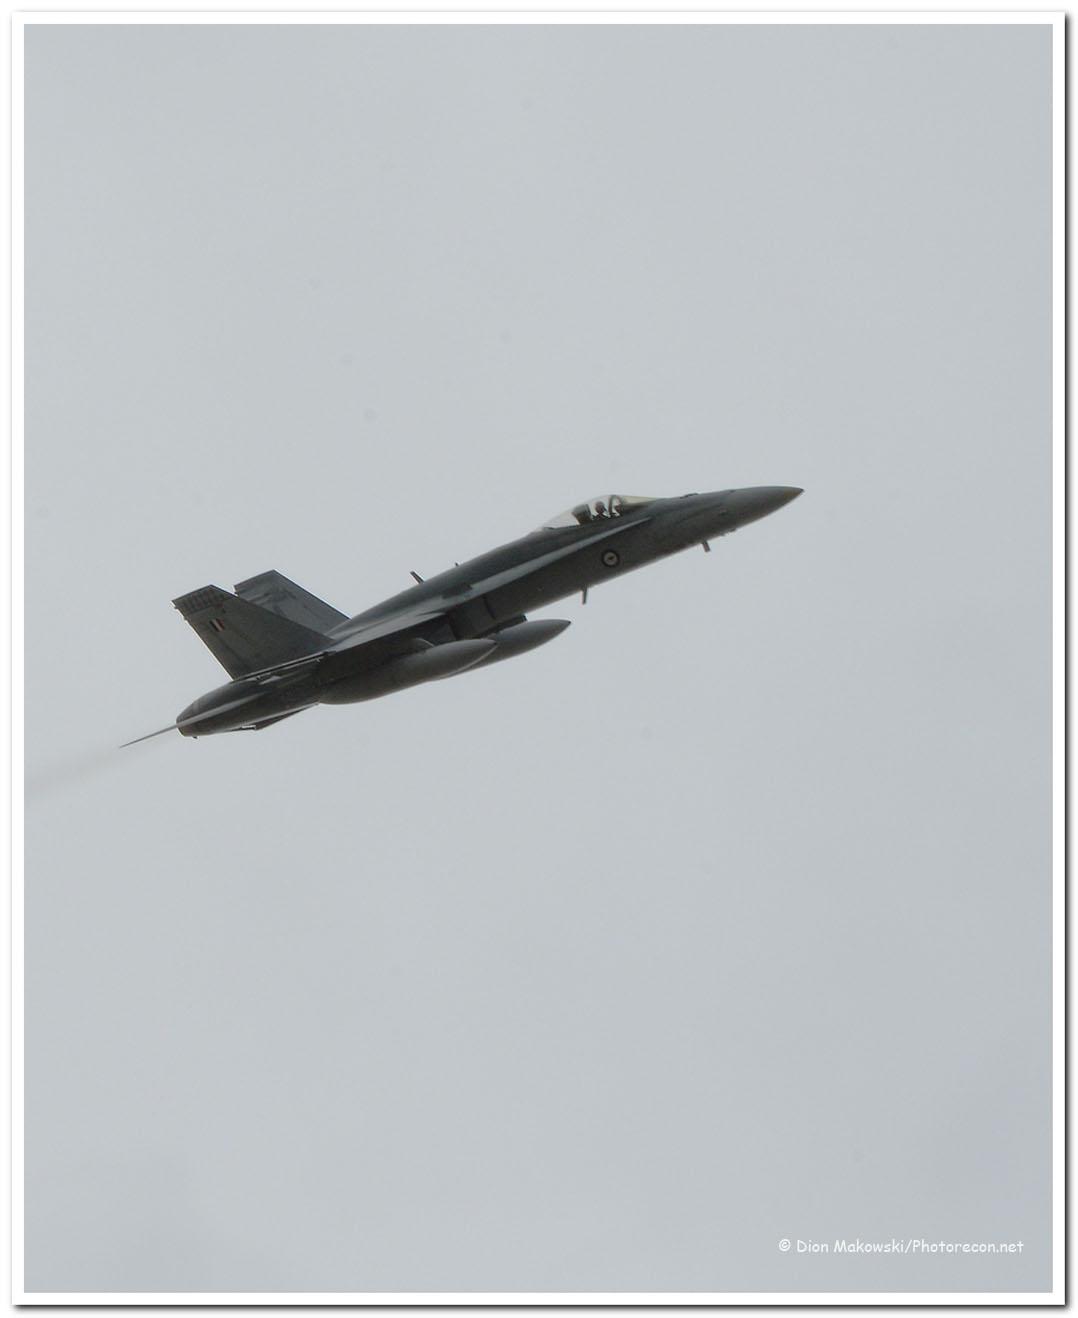 3 Squadron Hornet tribute